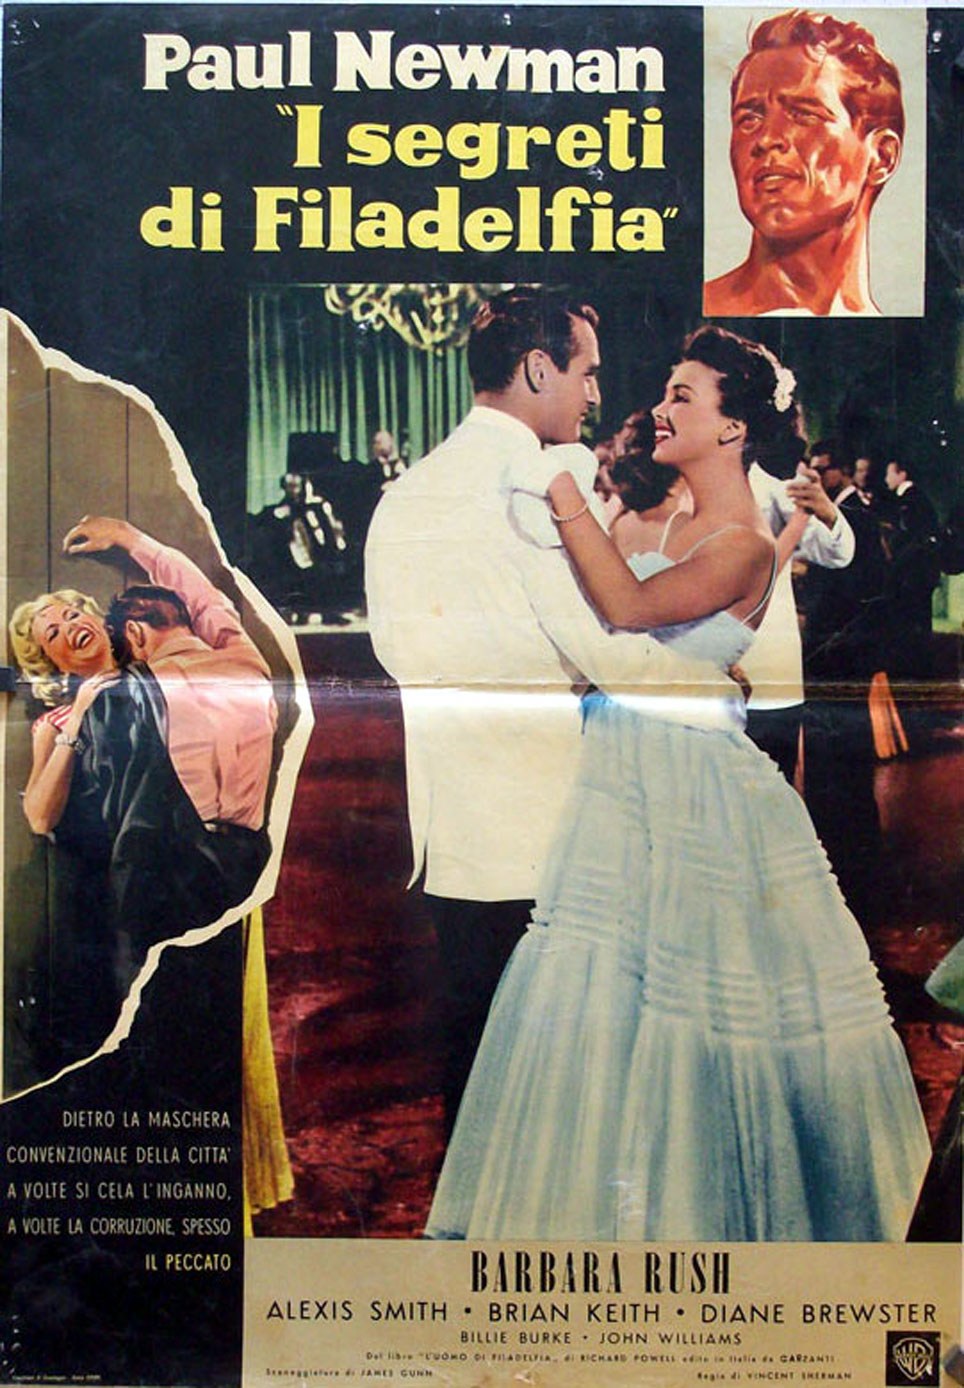 The young philadelphians movie